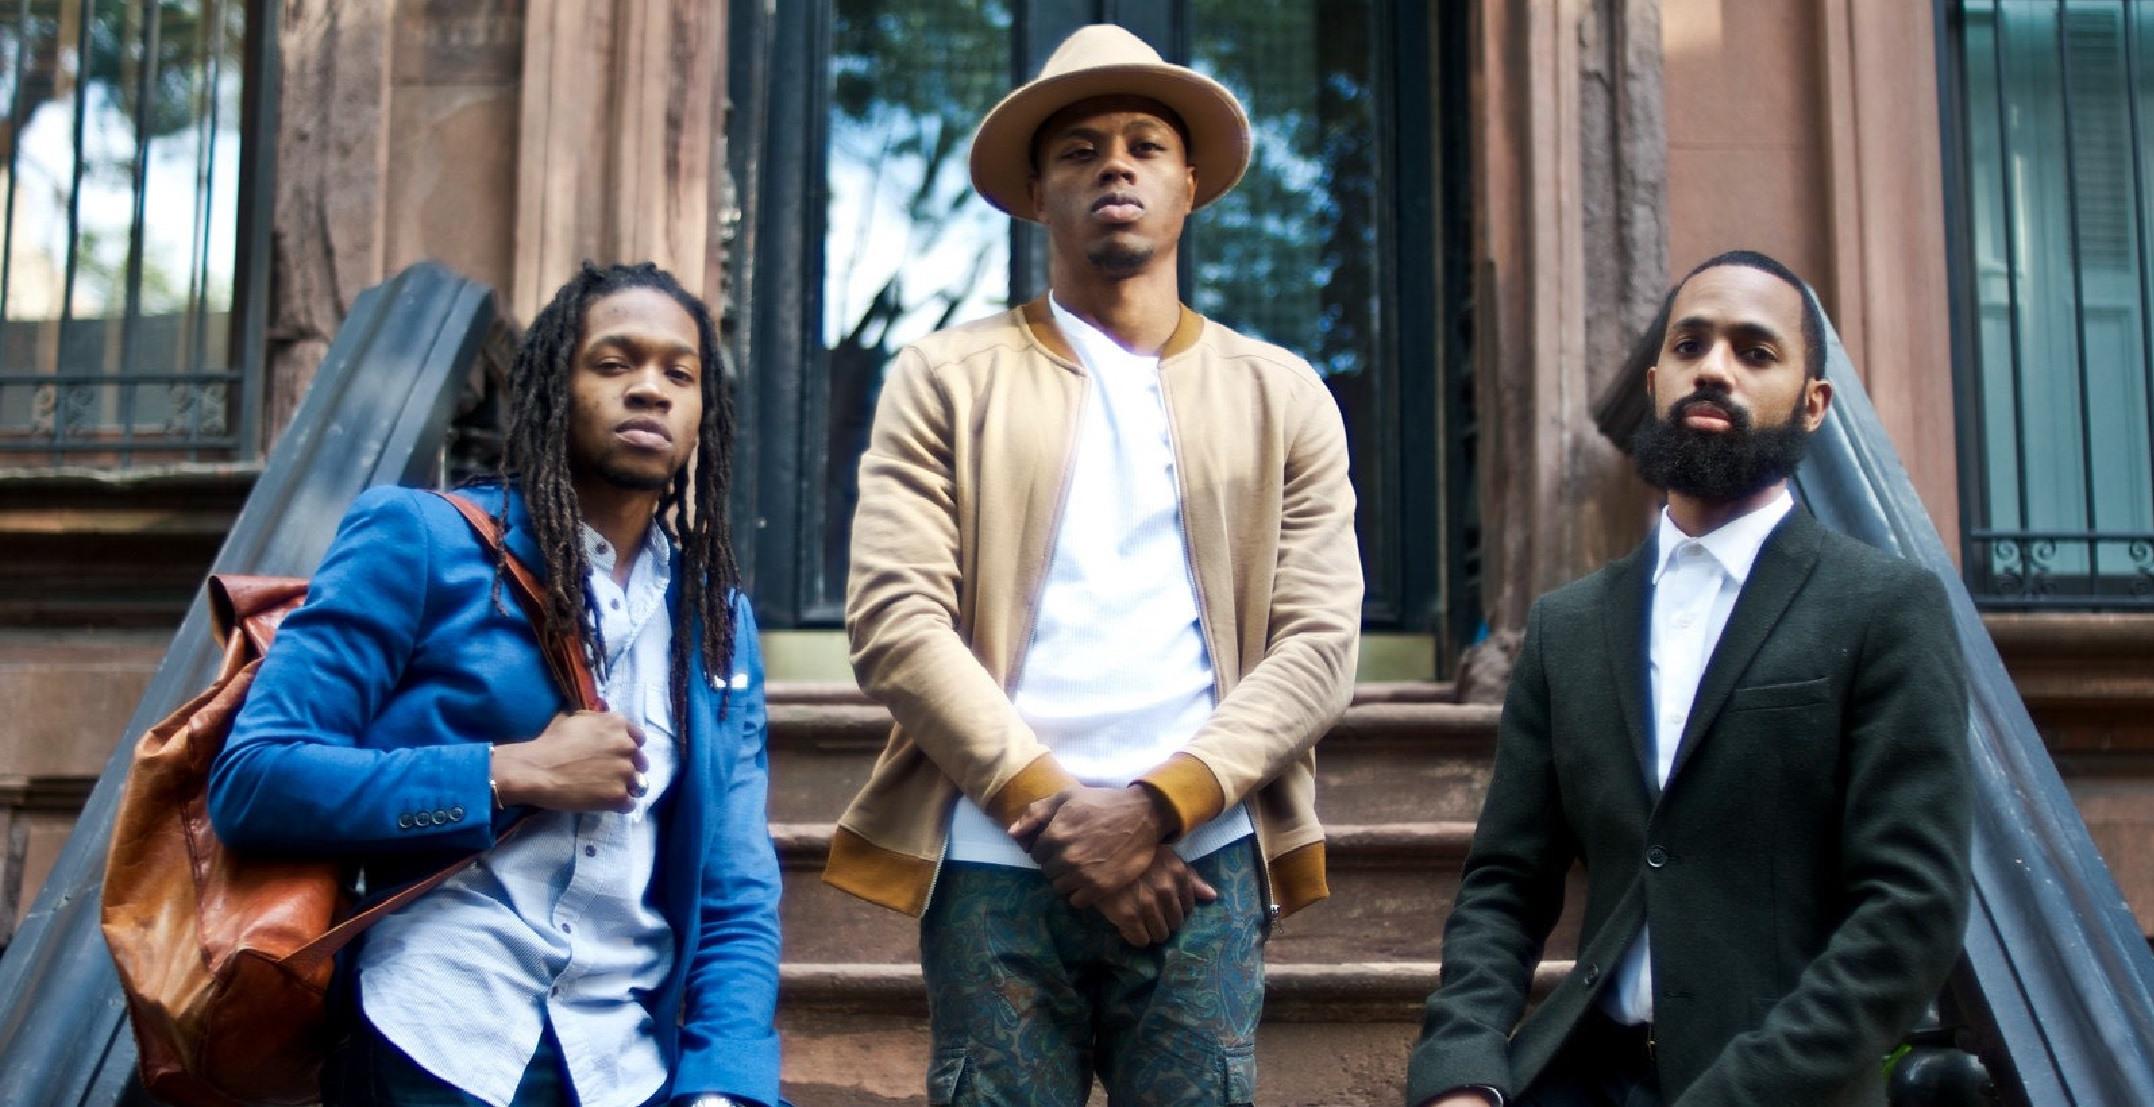 Brooklyn's Black innovators lead the way